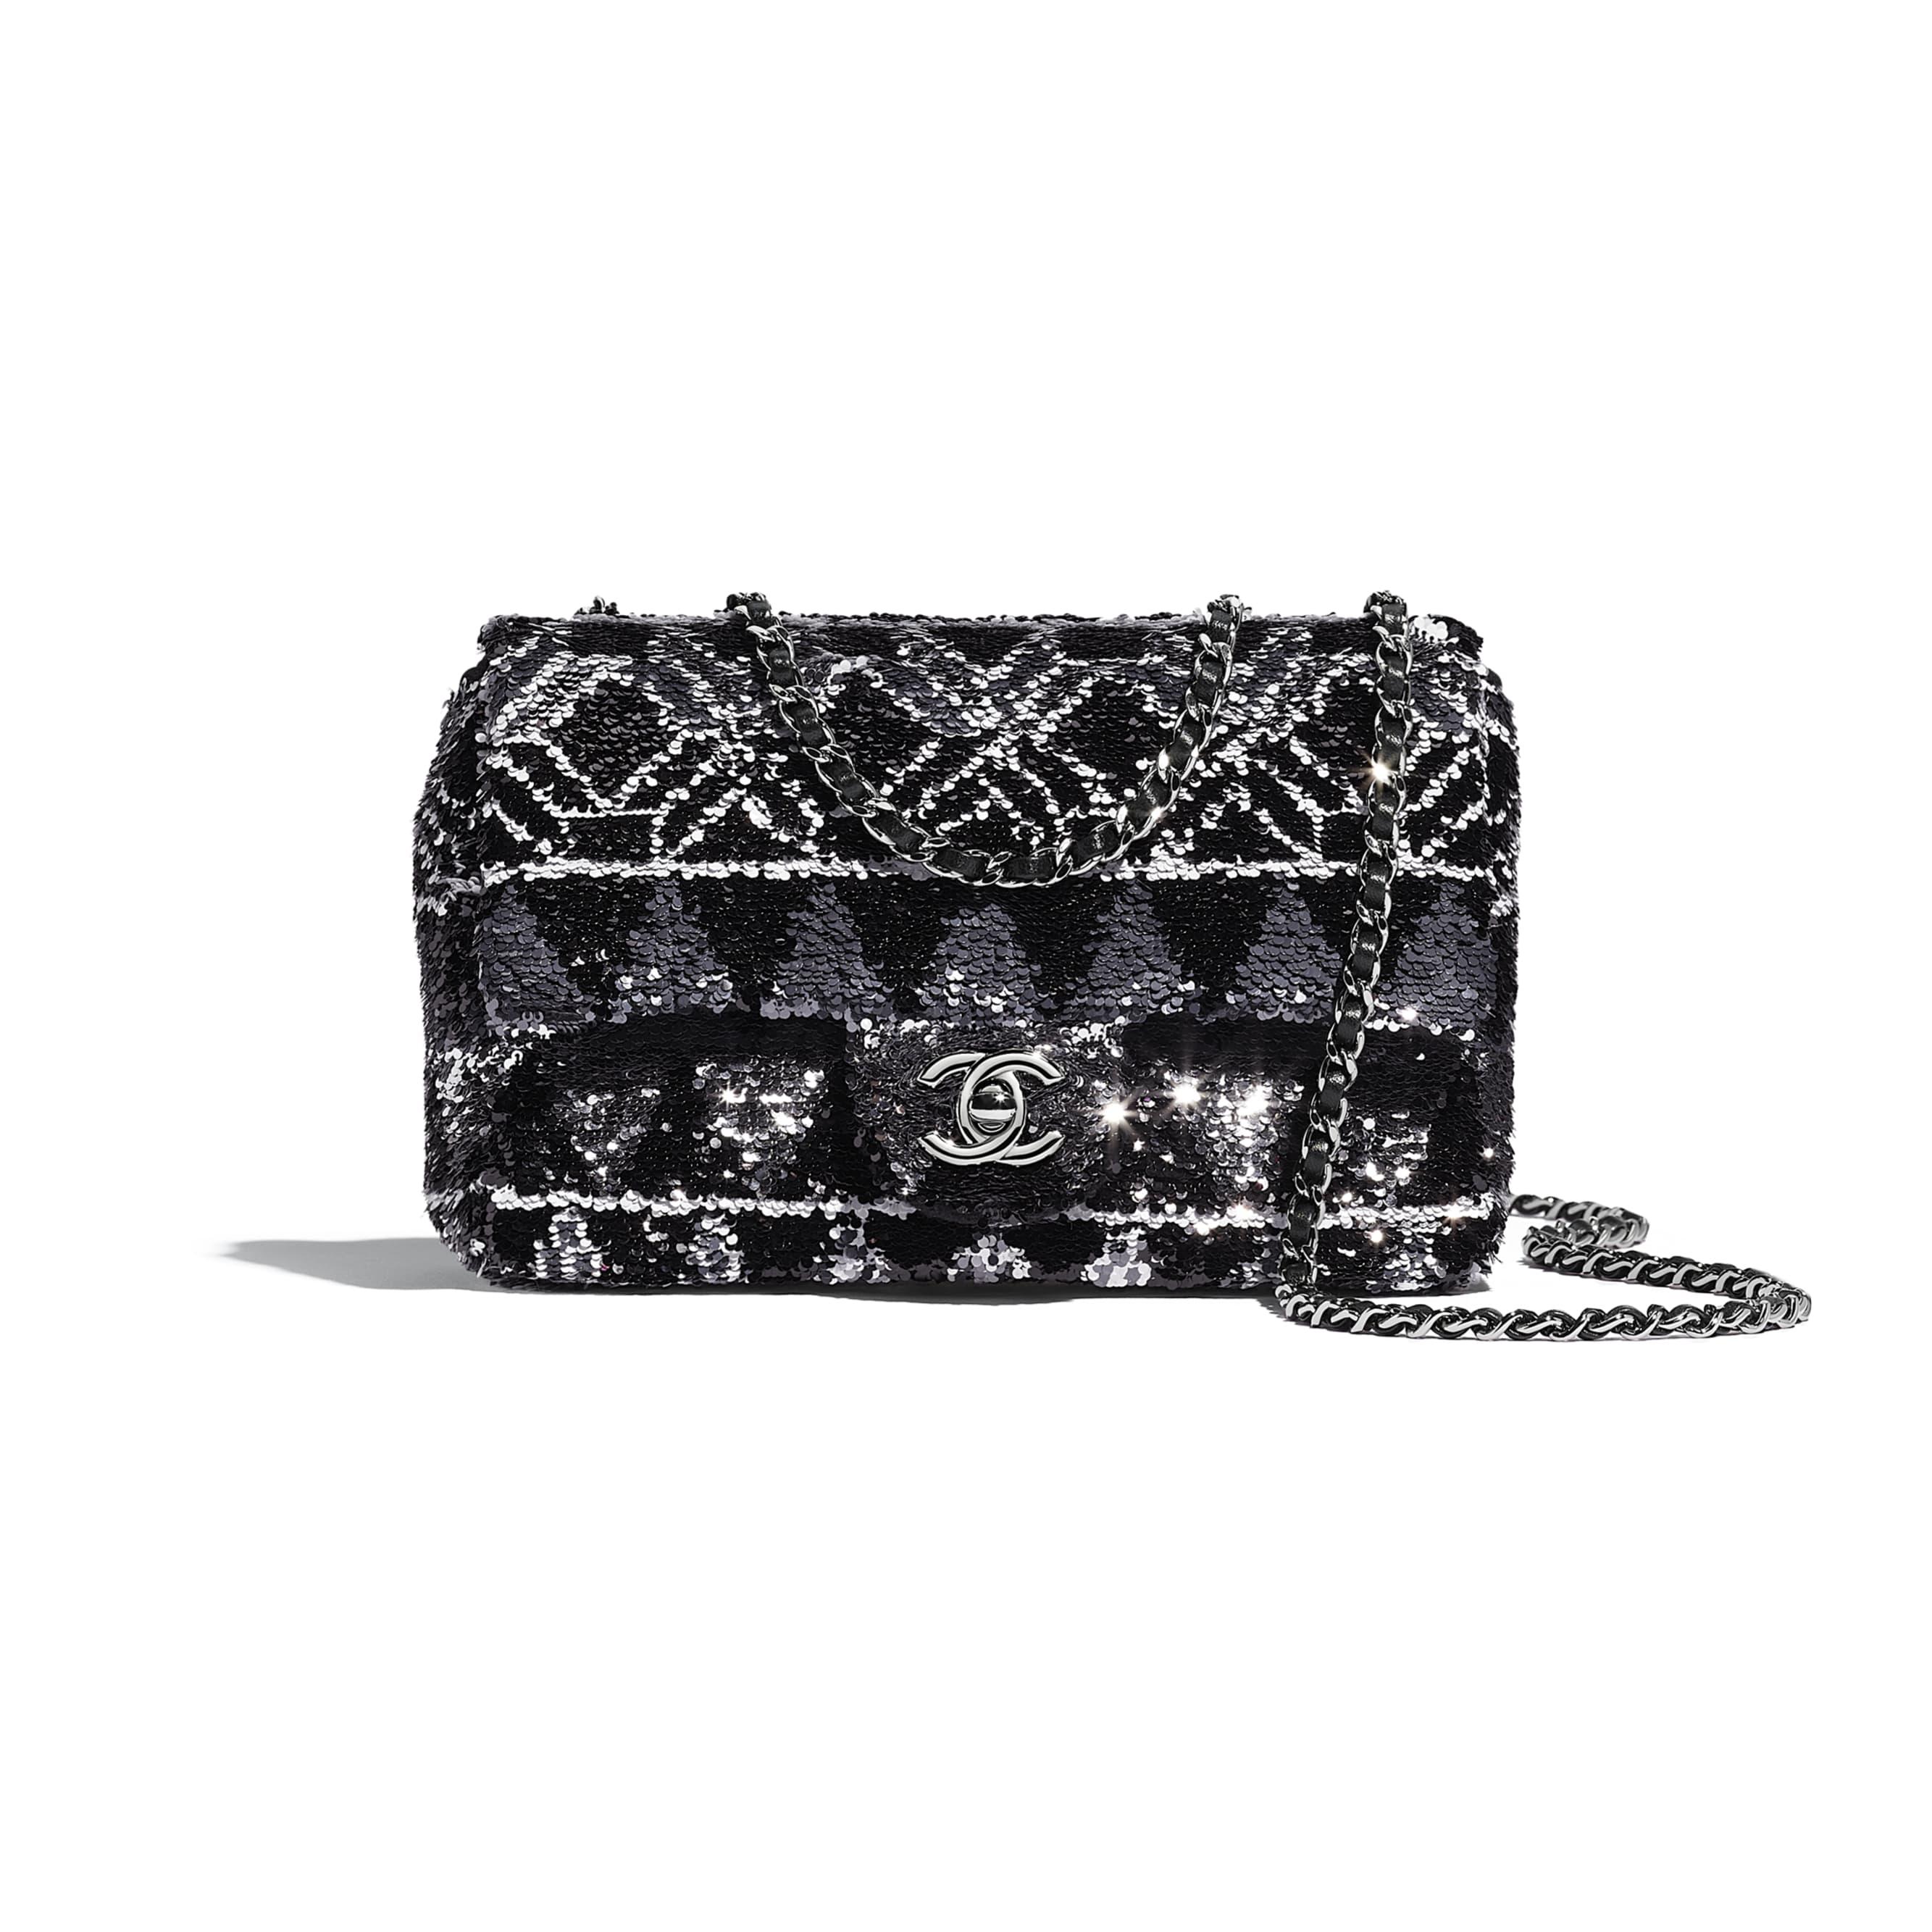 Flap Bag - Silver & Black - Sequins & Ruthenium-Finish Metal - Default view - see standard sized version